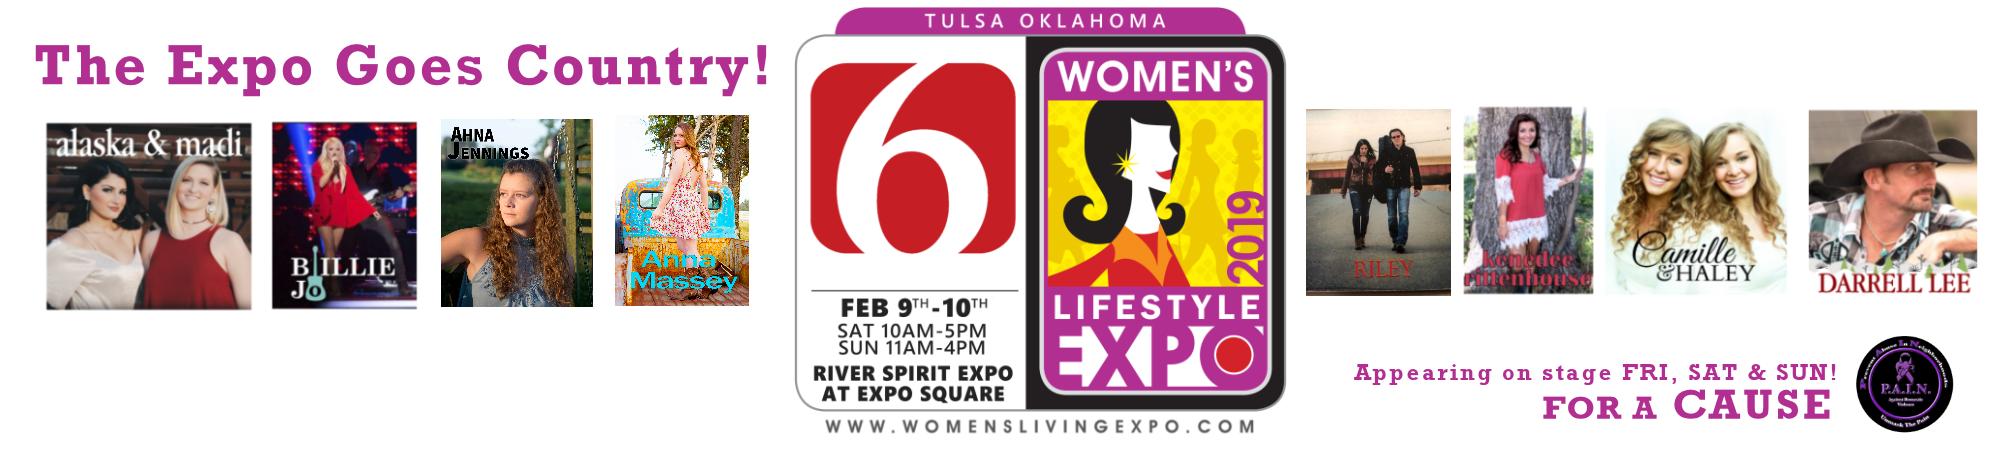 Tulsa Women's Lifestyle & Home Design Expo header image